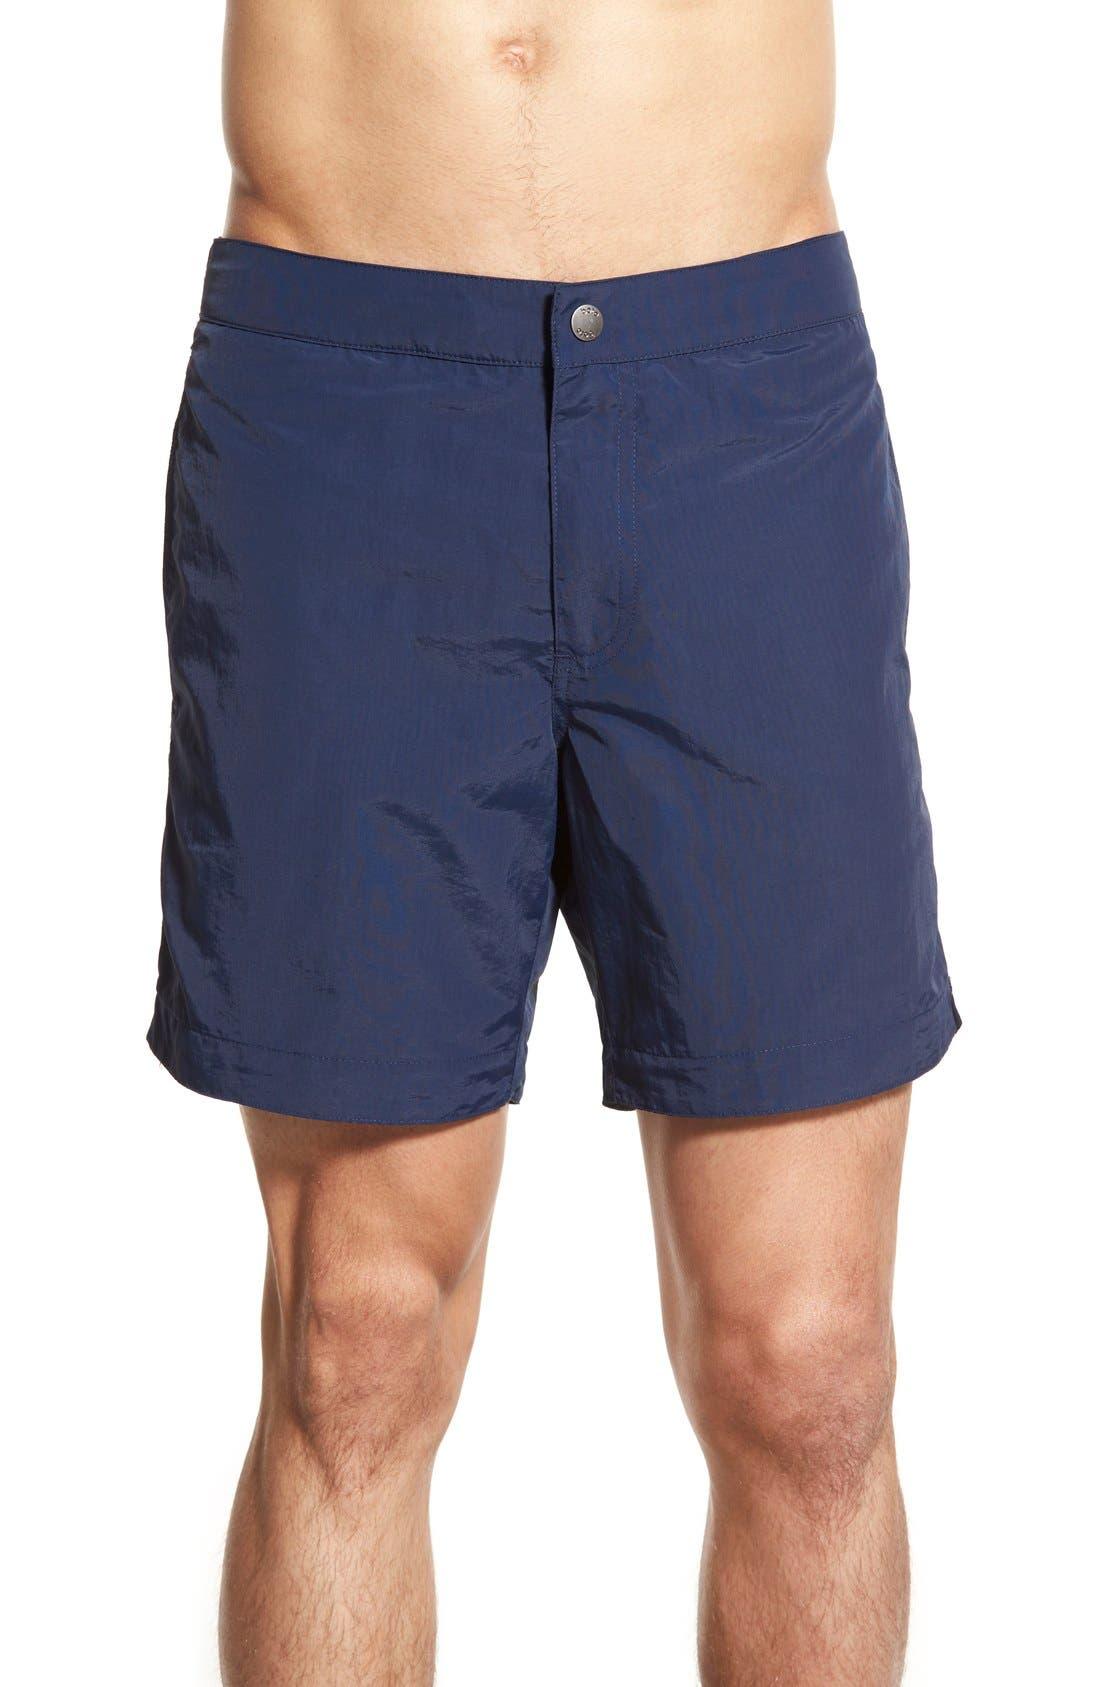 boto 'Aruba' Tailored Fit 6.5 Inch Swim Trunks